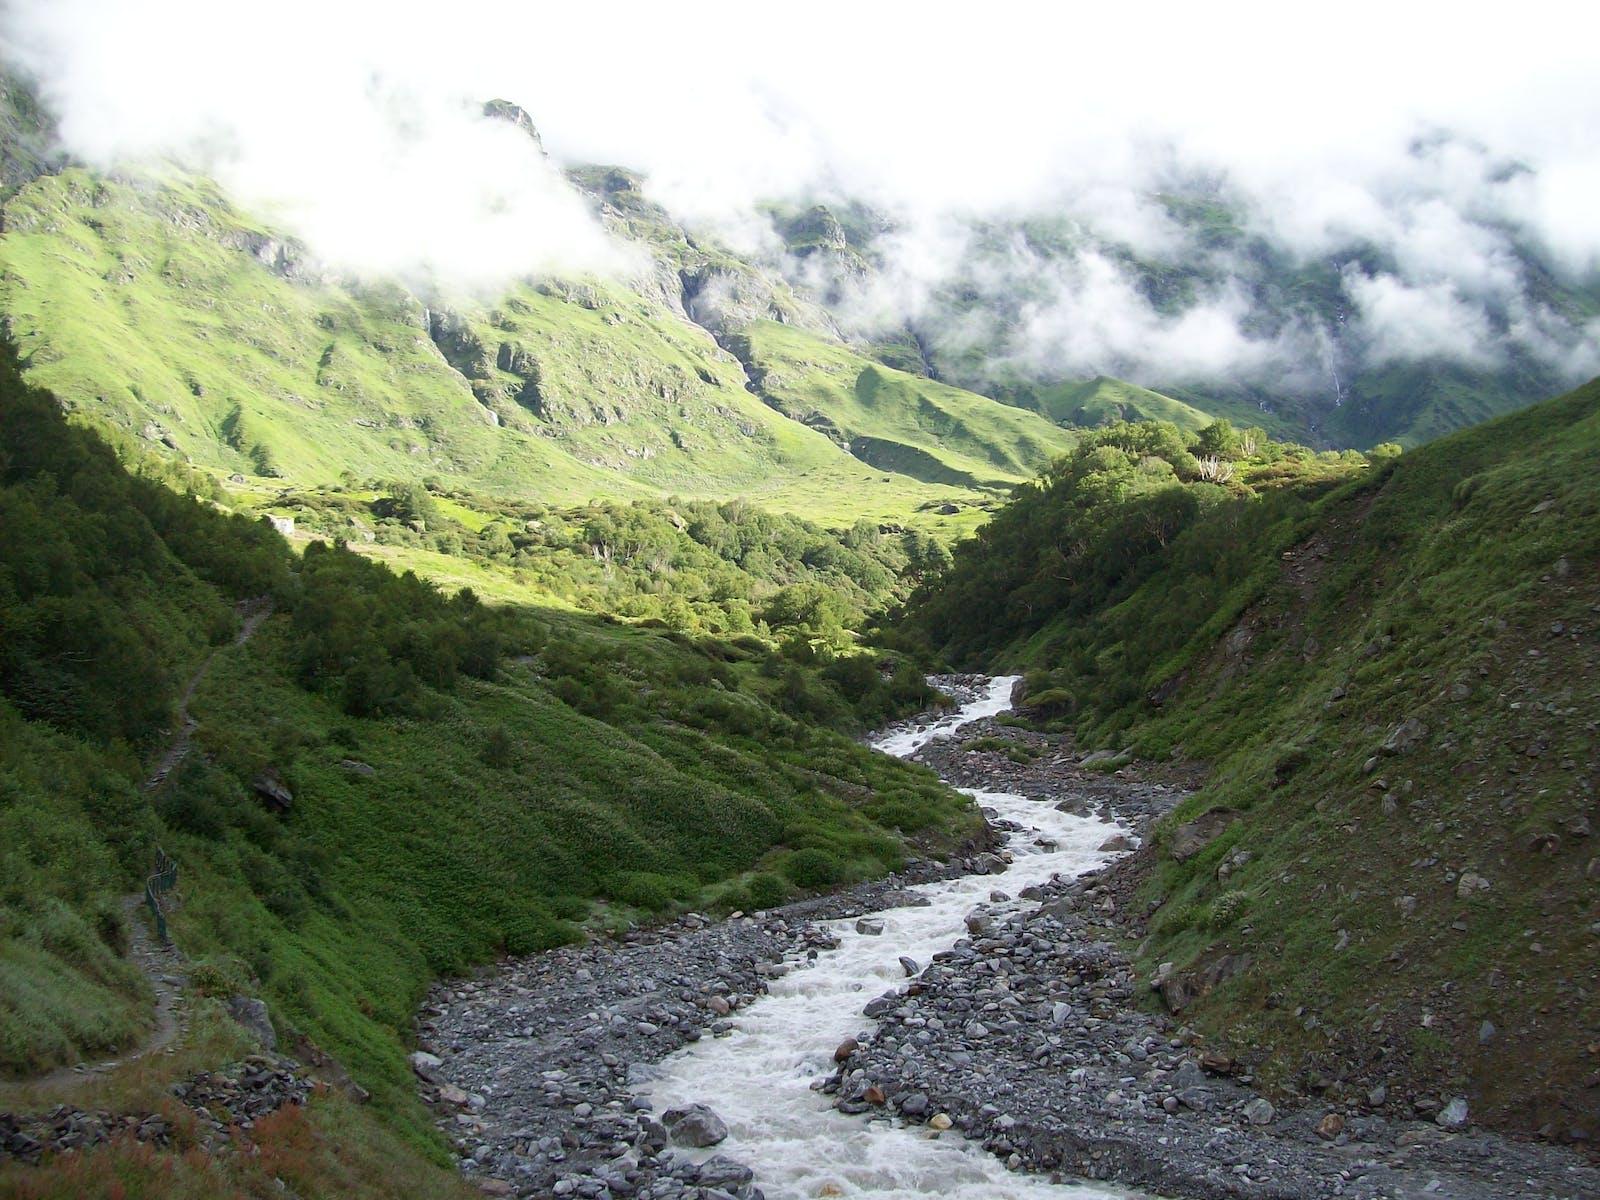 Western Himalayan Alpine Shrub and Meadows